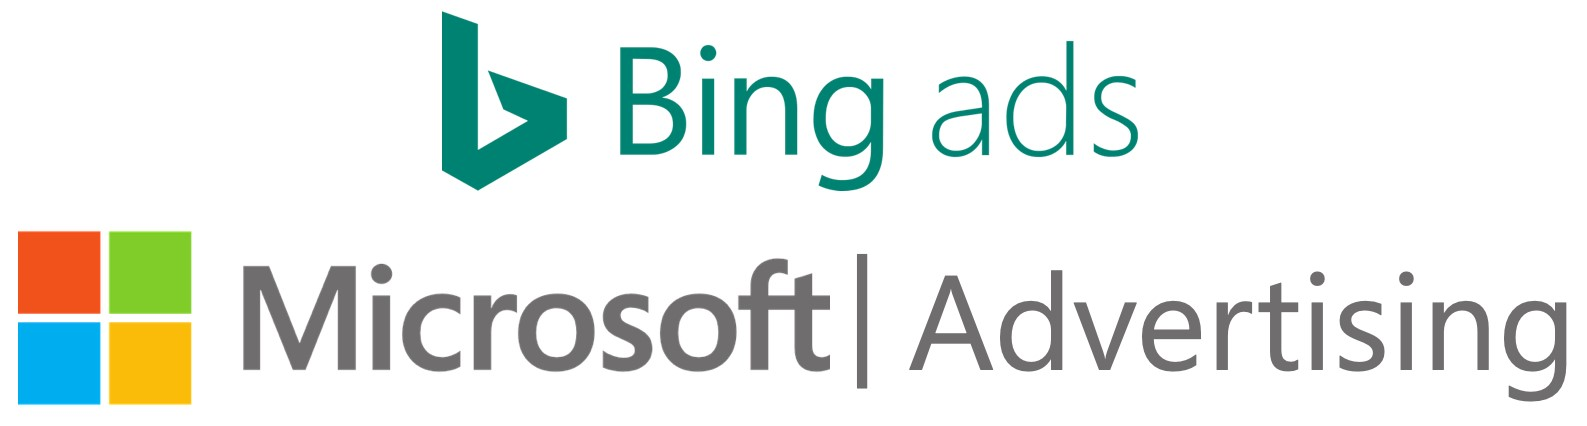 bing ads microsoft advertising